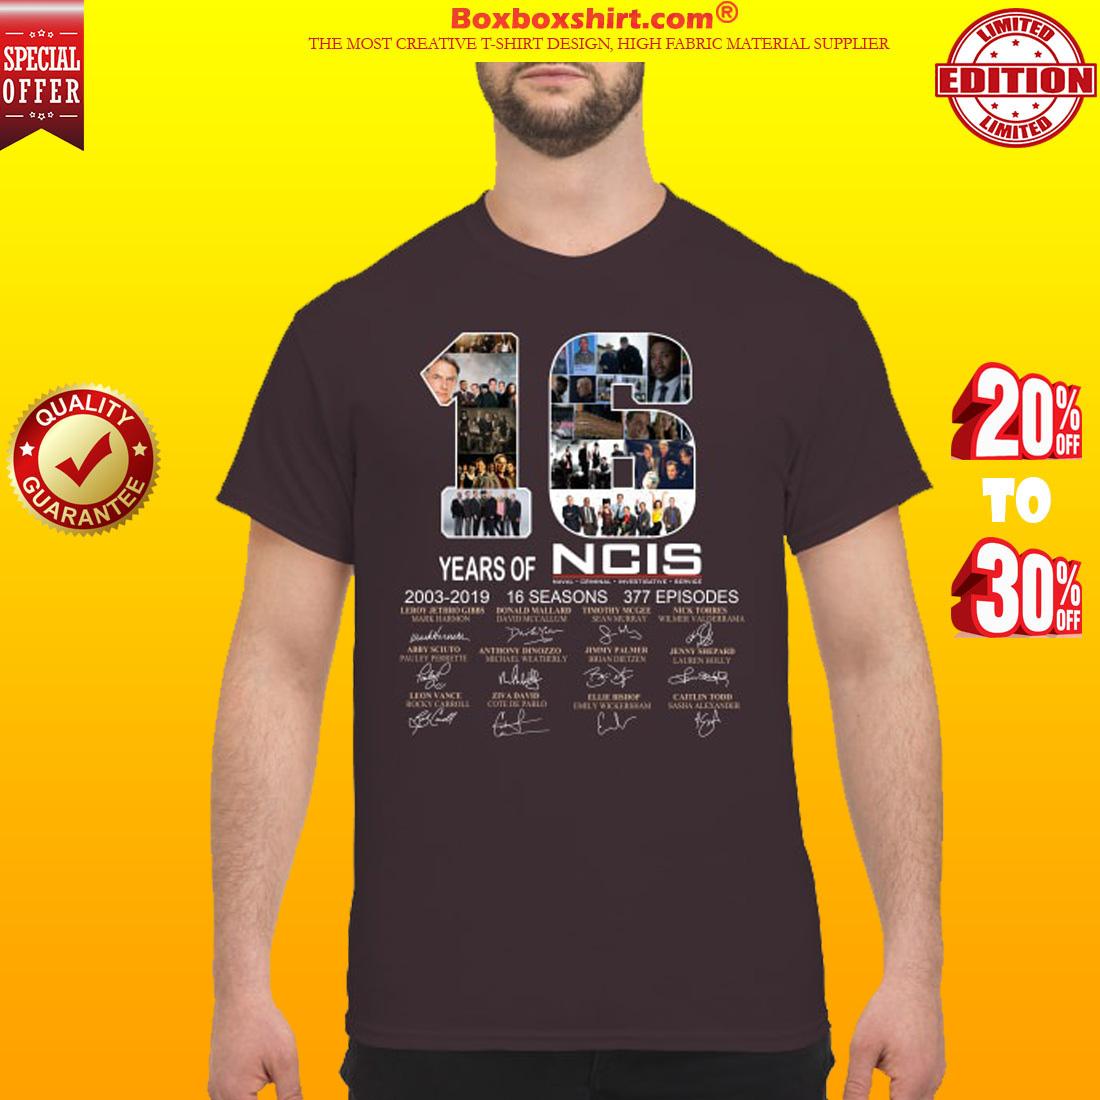 16 years of NCIS 2003 2019 shirt